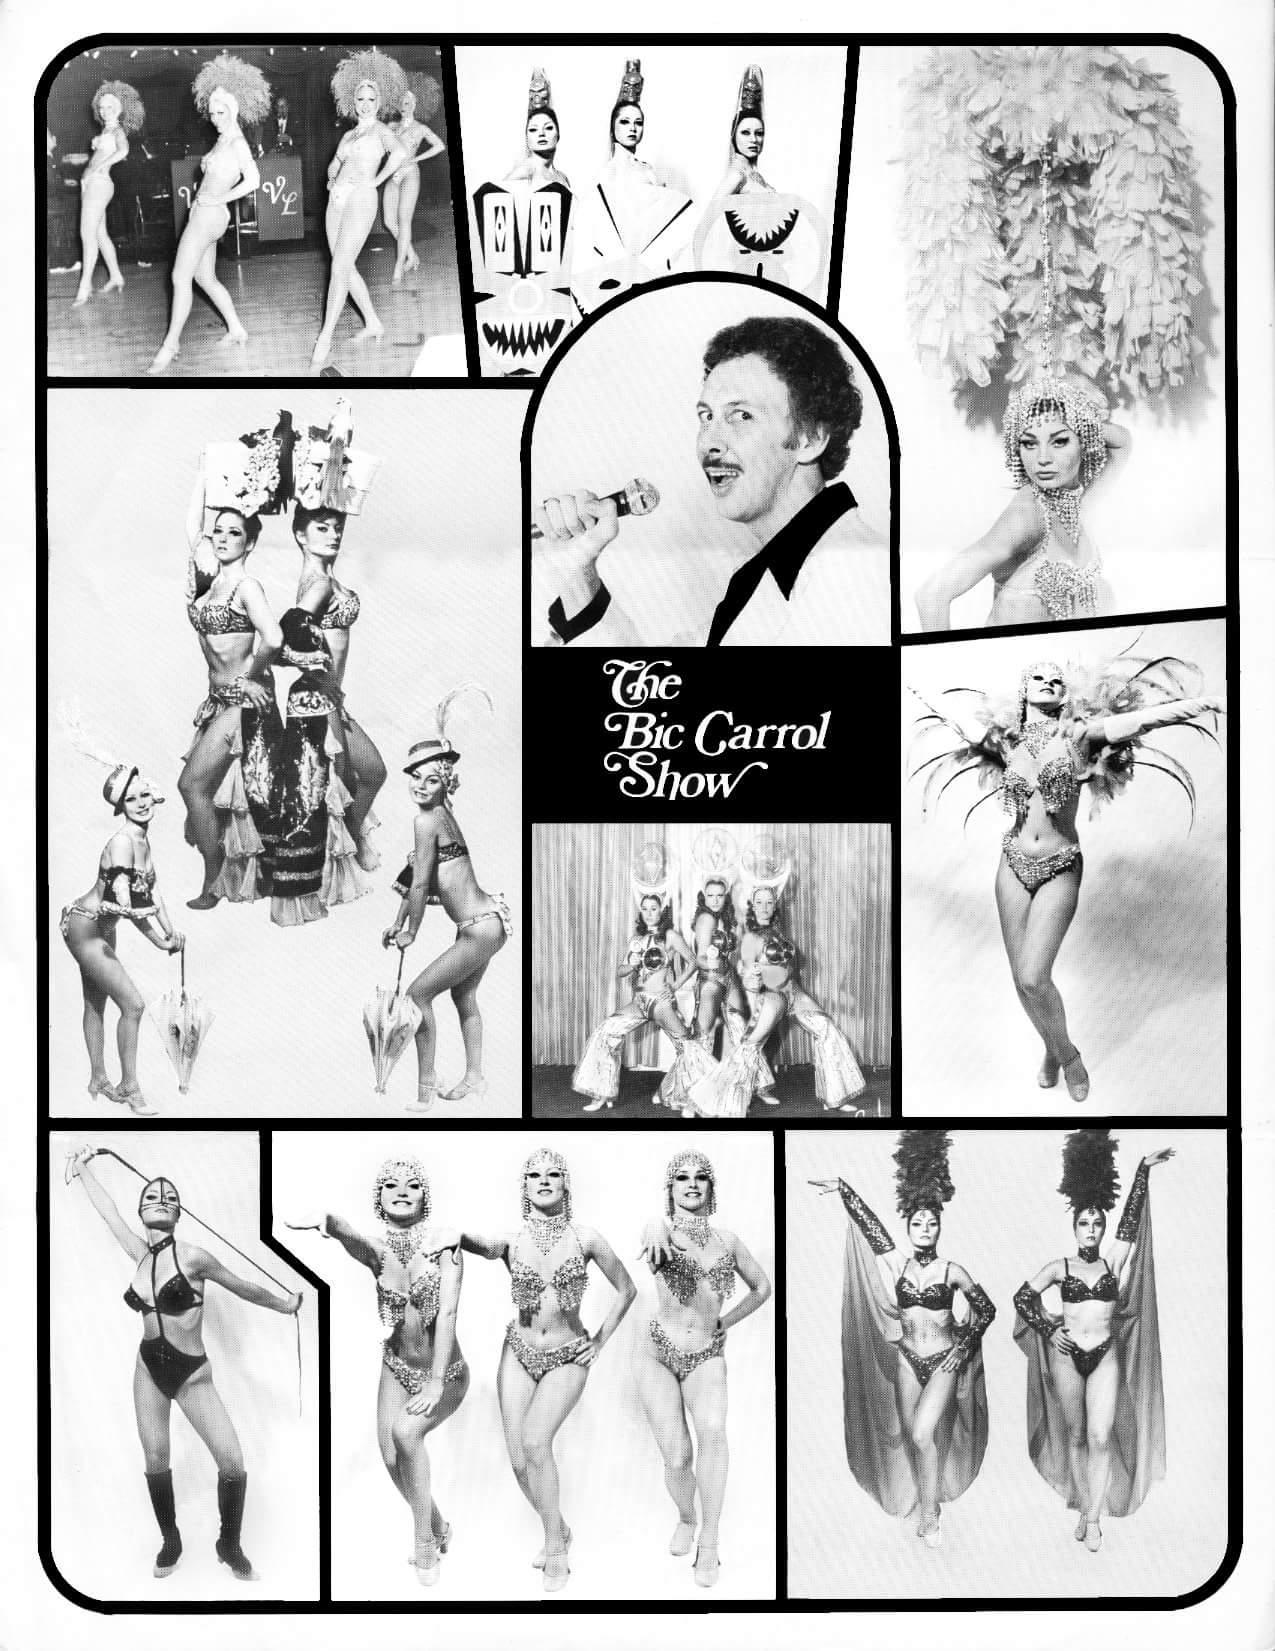 The Bic Carrol Show - Burlesque Legend